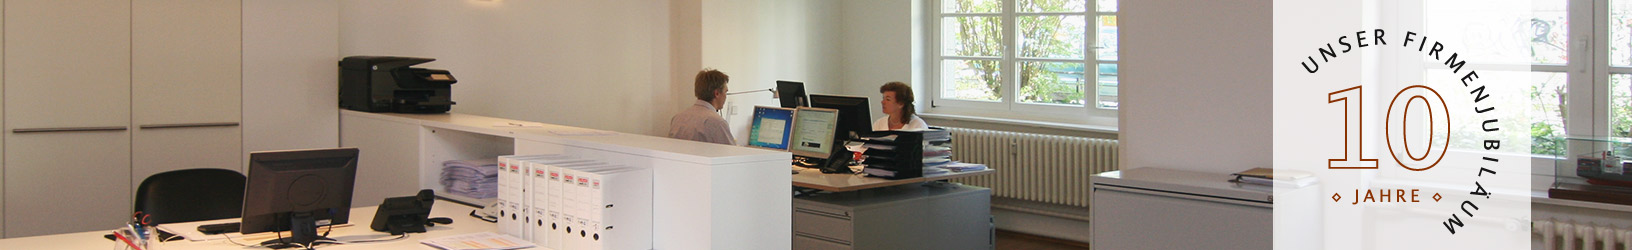 Lang GmbH Berlin - 10 Jahre Jubiläum